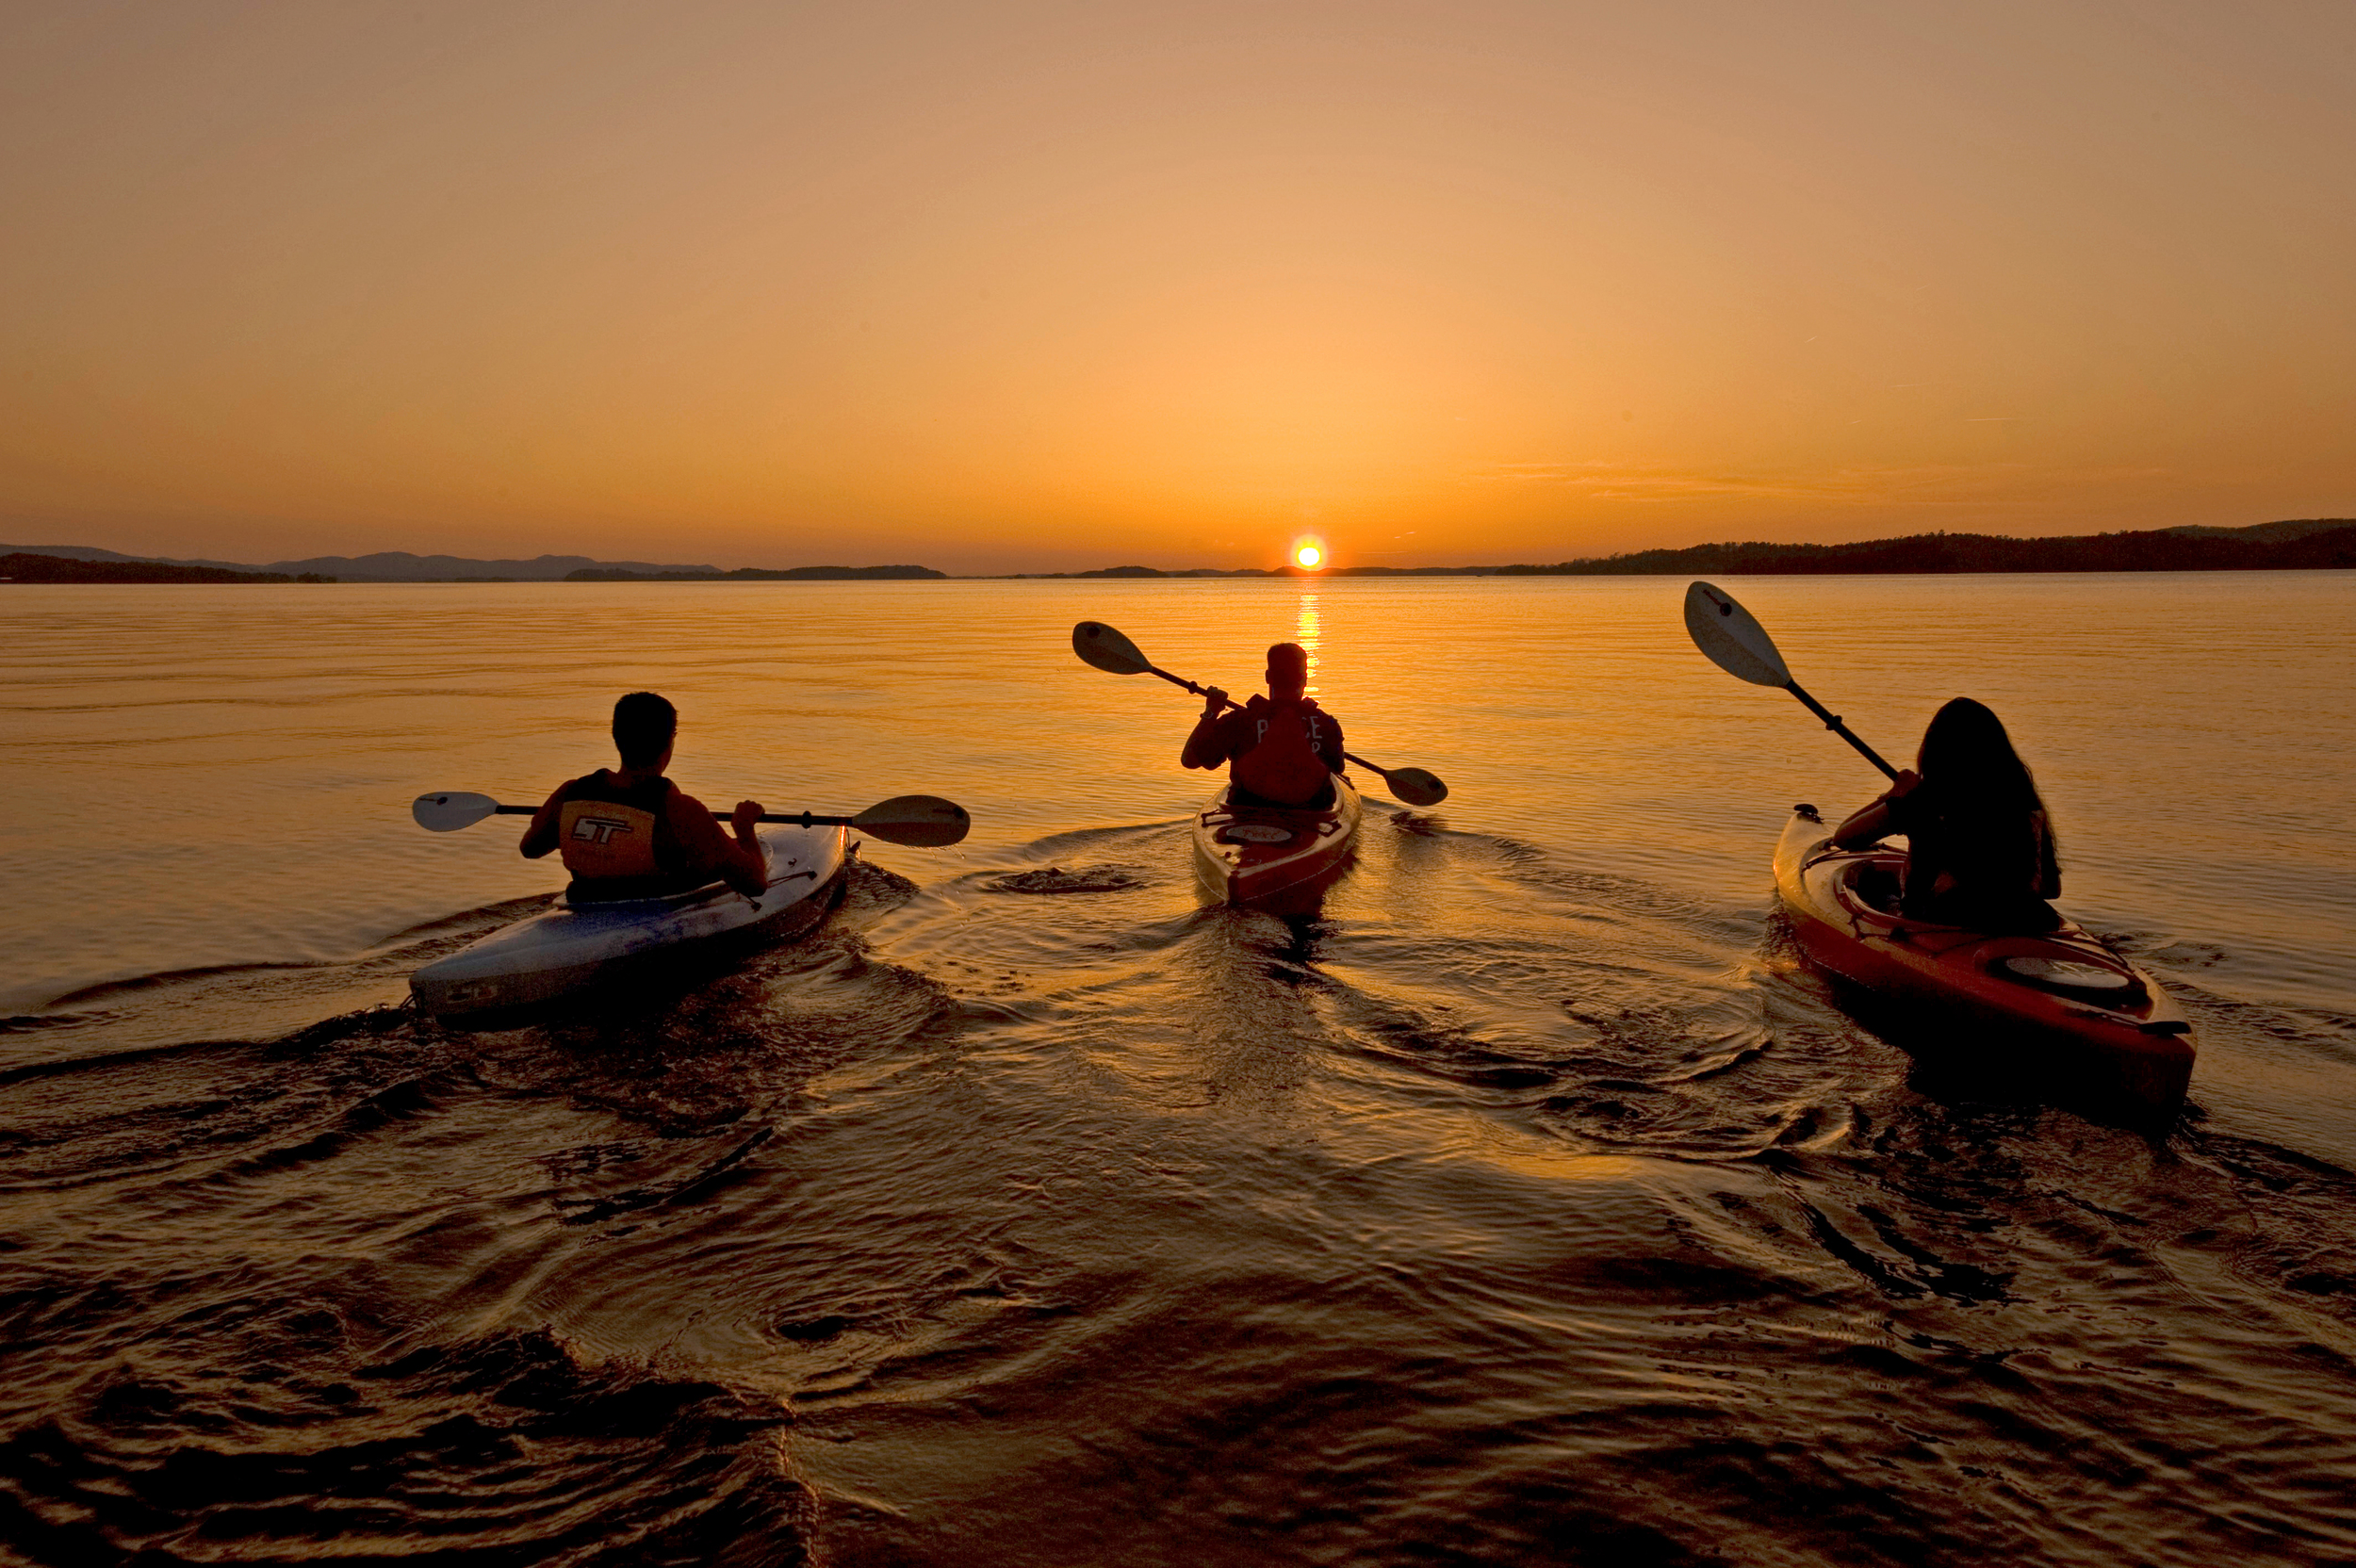 Lake_Ouachita_State_Park_Kayaking_ACH214.JPG